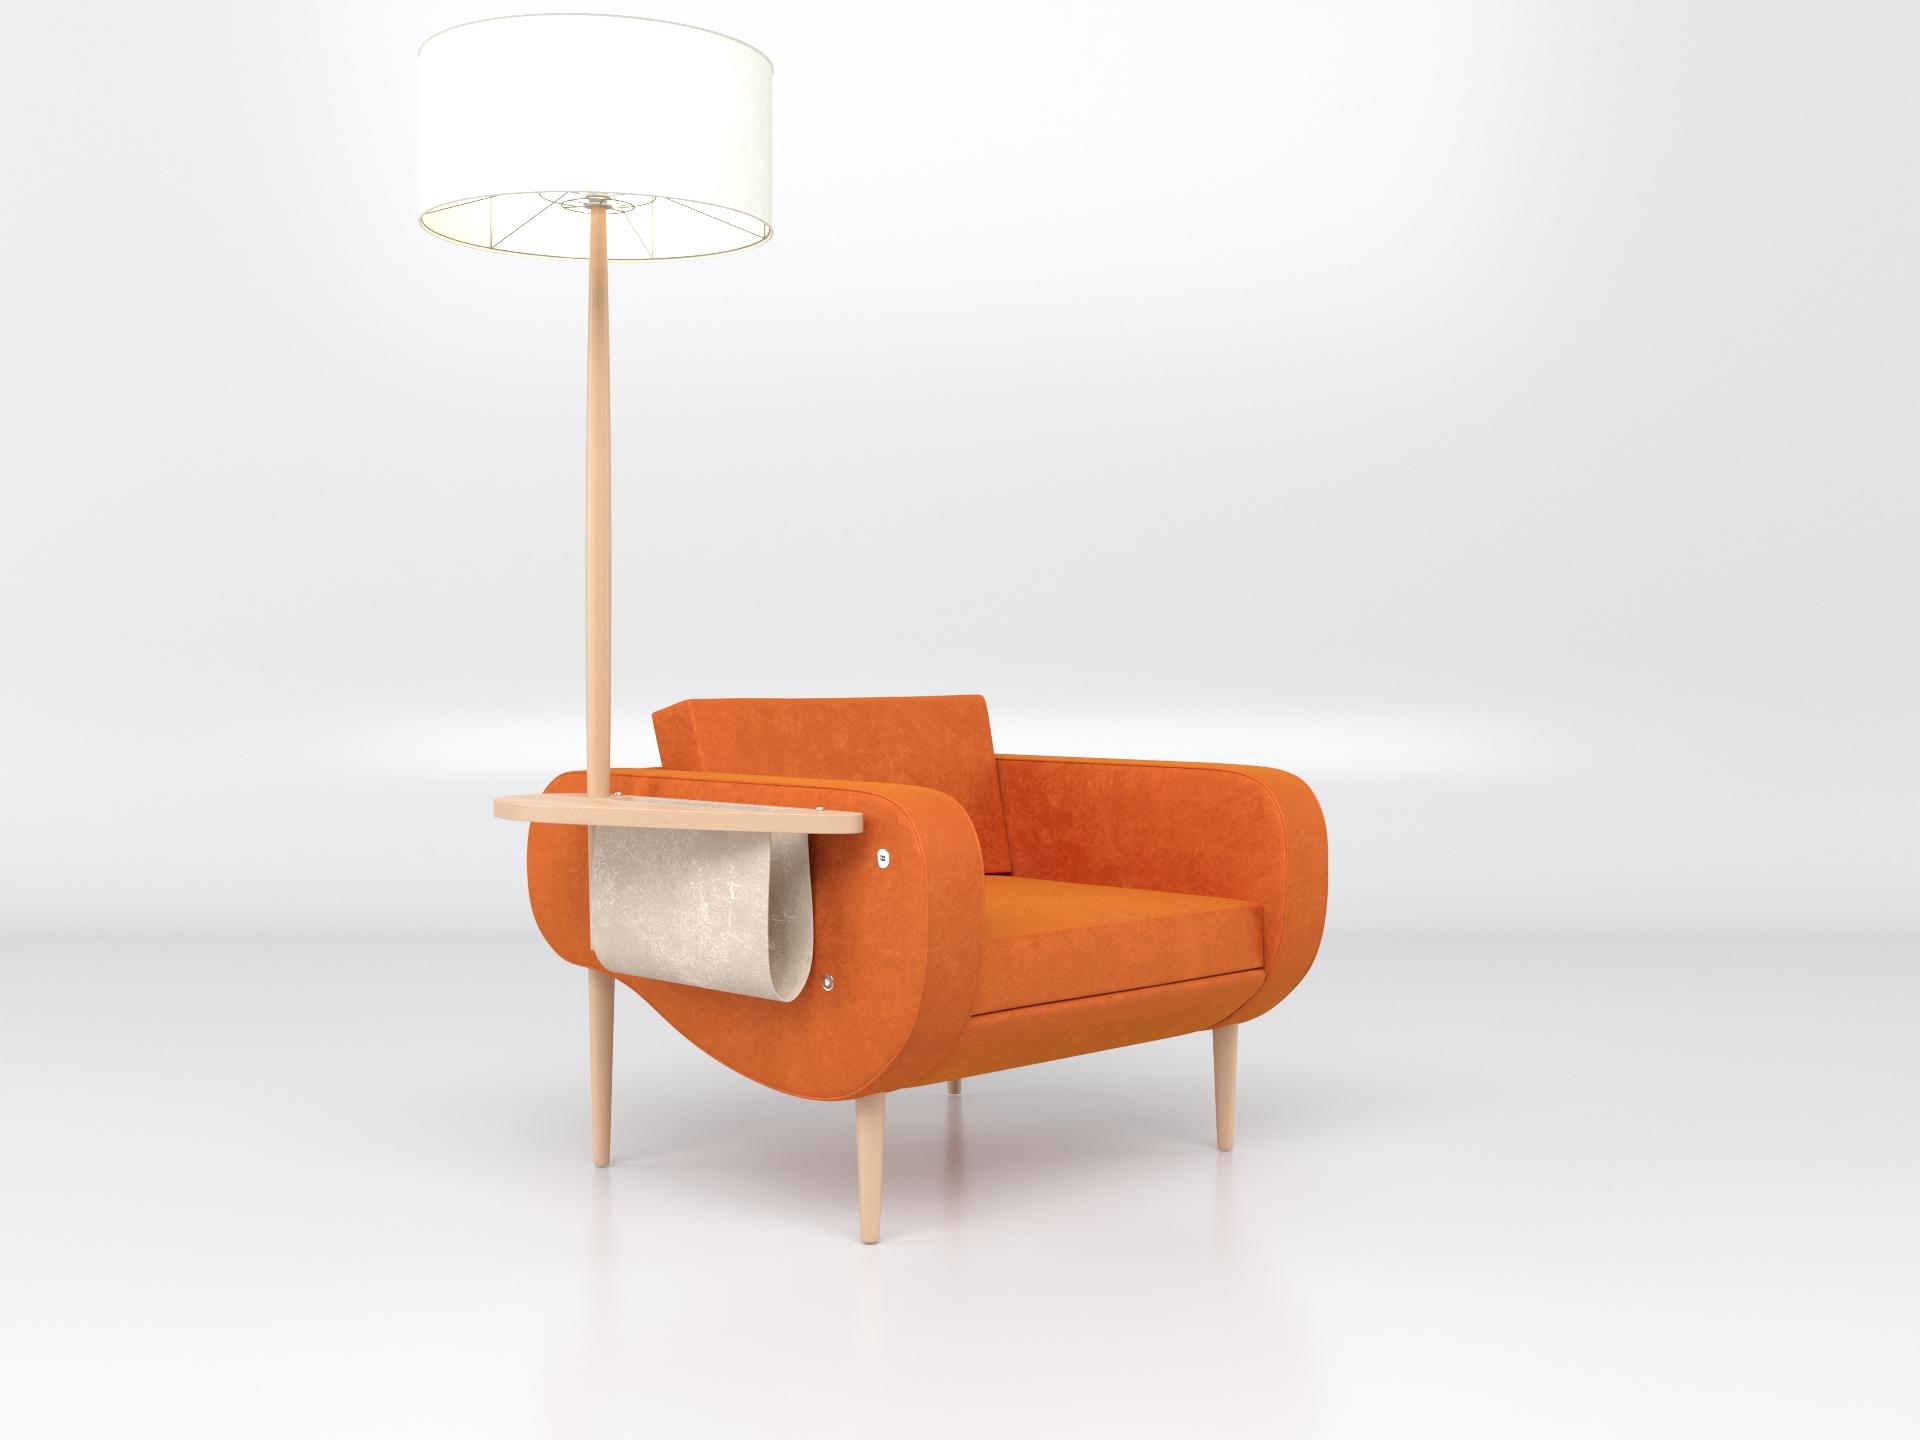 Illuminé canapé Illuminé Fauteuil Illuminé Tabouret adossé Frédéric TABARY Designer